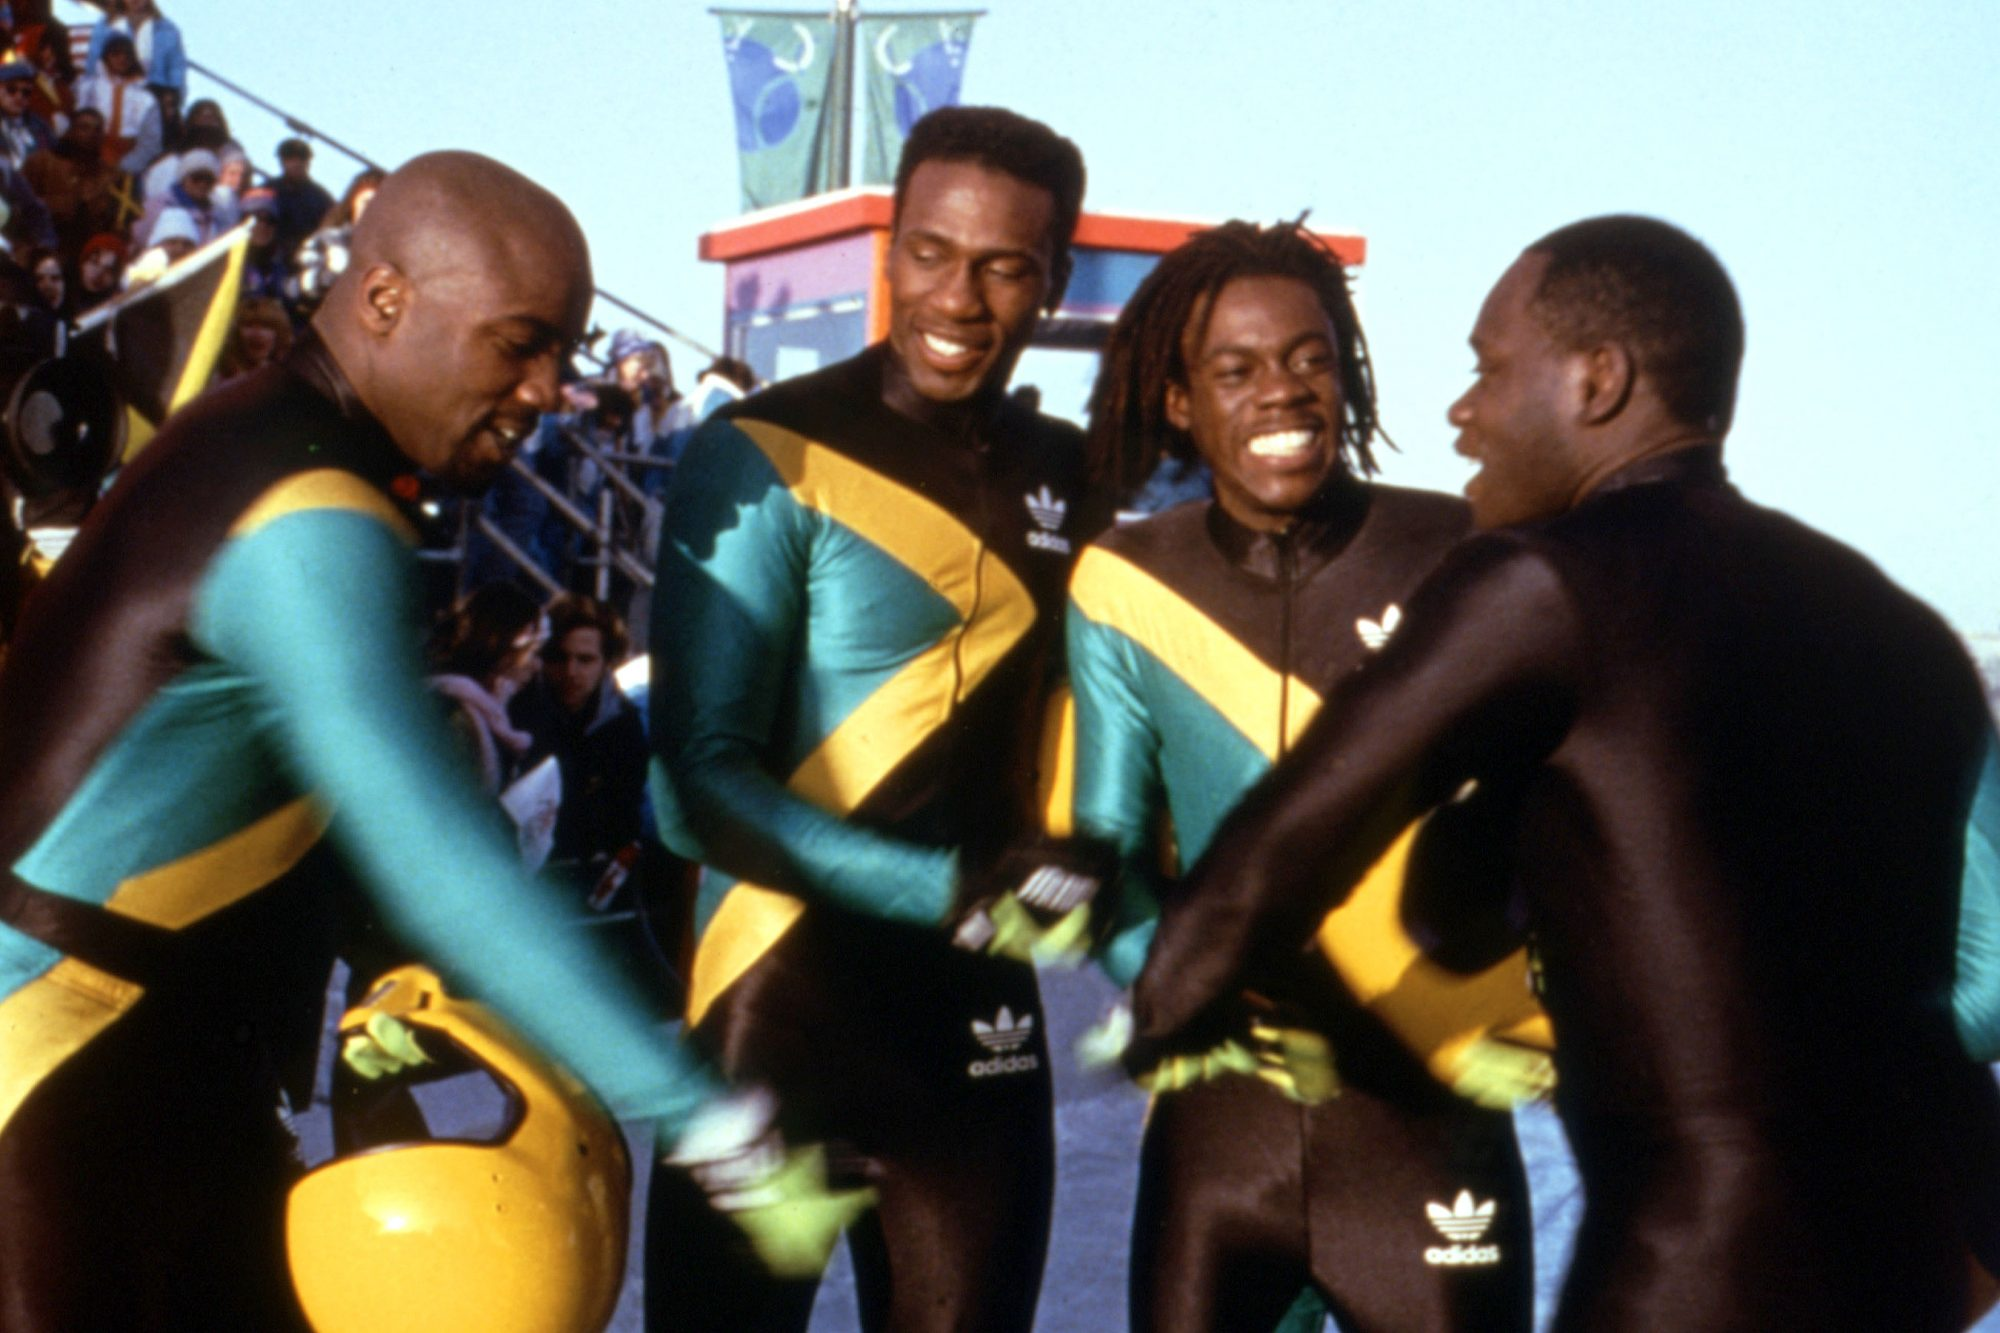 COOL RUNNINGS, Malik Yoba, Leon, Doug E. Doug, Rawle D. Lewis, 1993, (c)Buena Vista Pictures/courtes